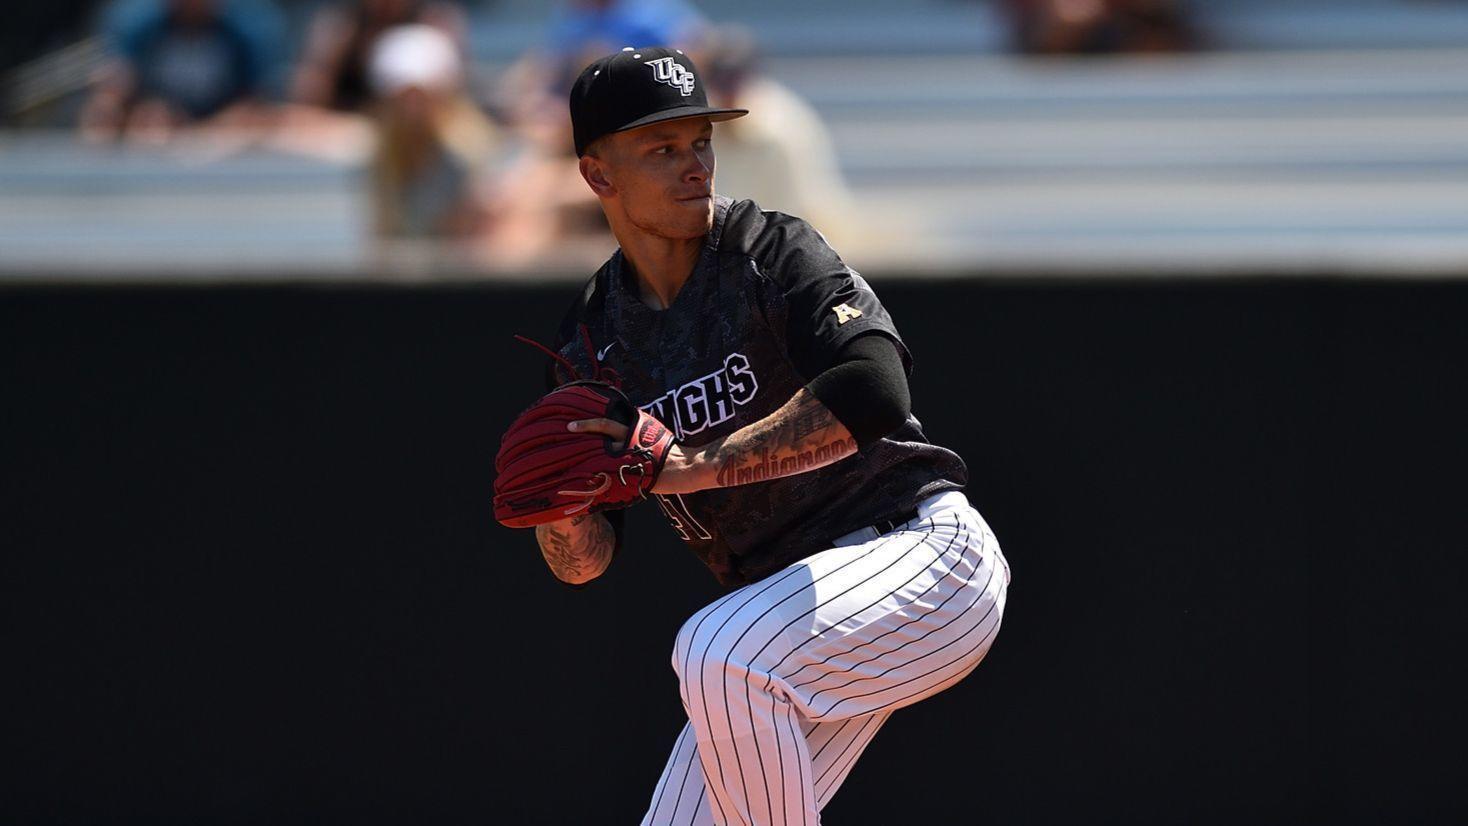 Os-sp-ucf-baseball-jj-montgomery-draft-0605